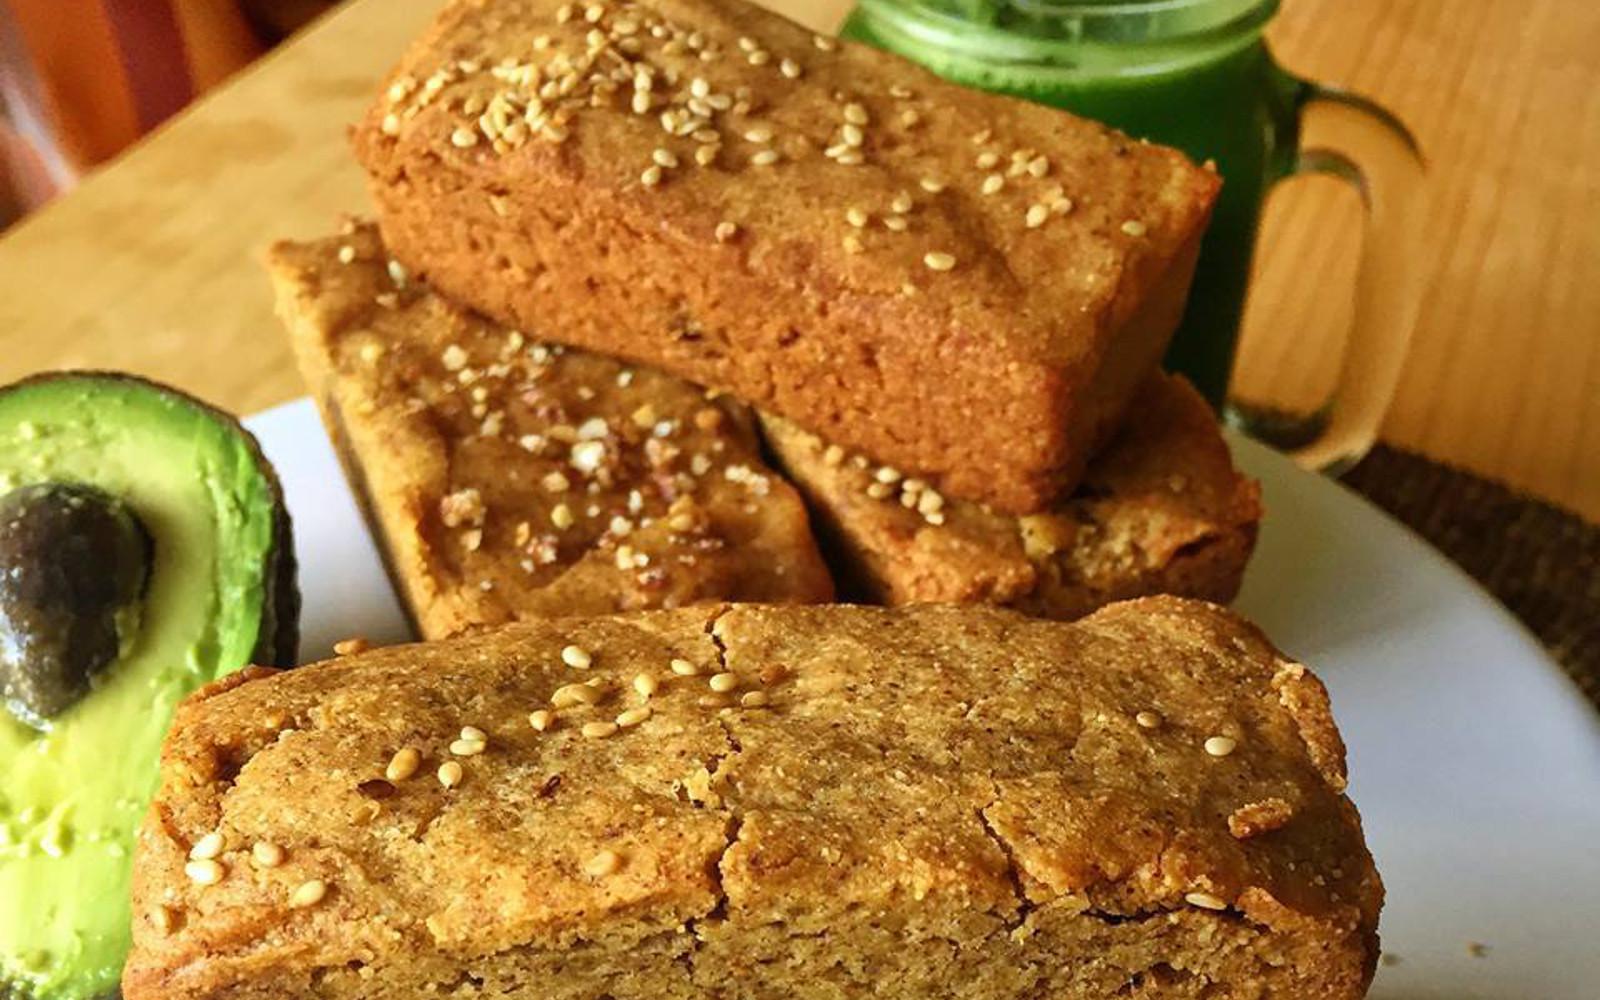 Almond Flour Sandwich Bread